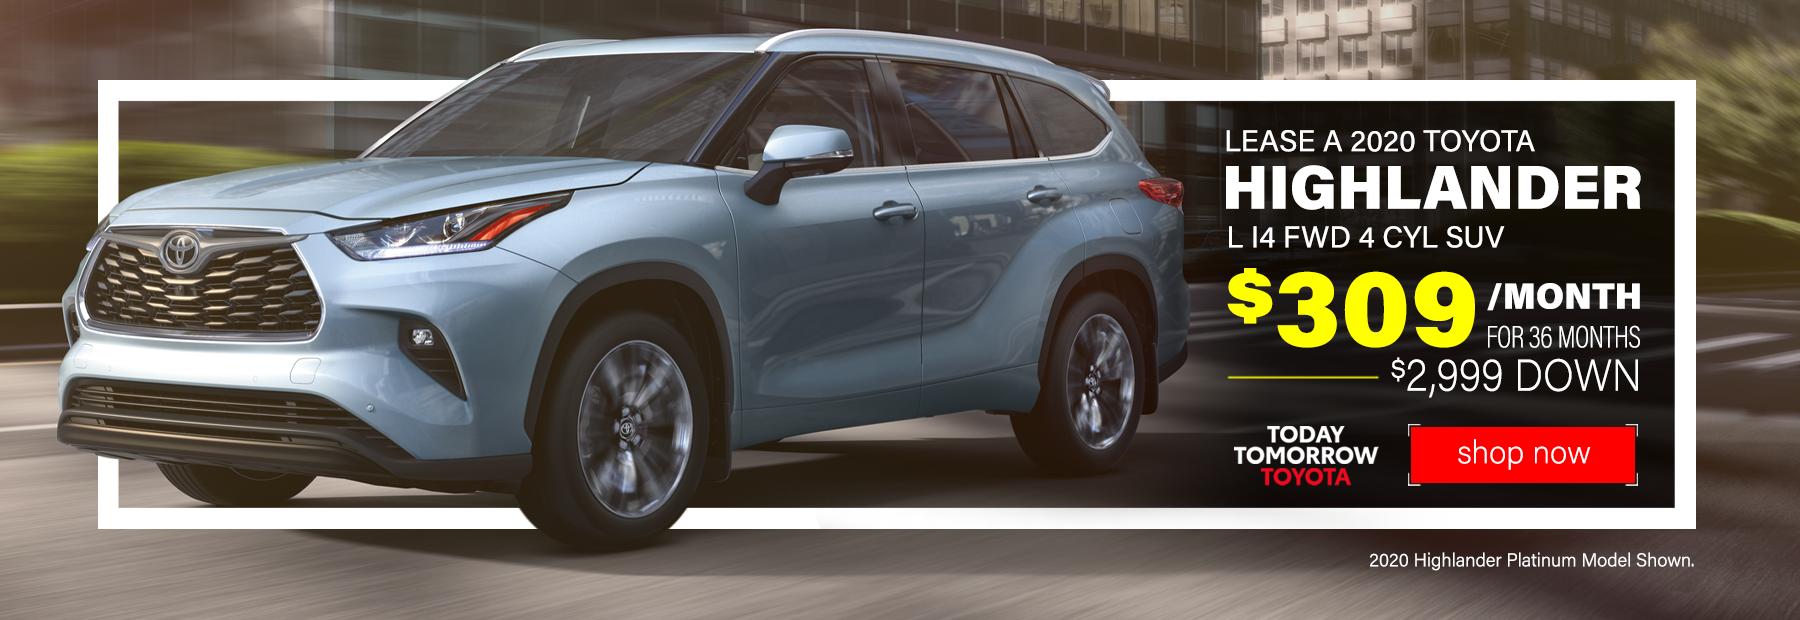 New 2020 Toyota Highlander Lease Deals in Cincinnati, OH